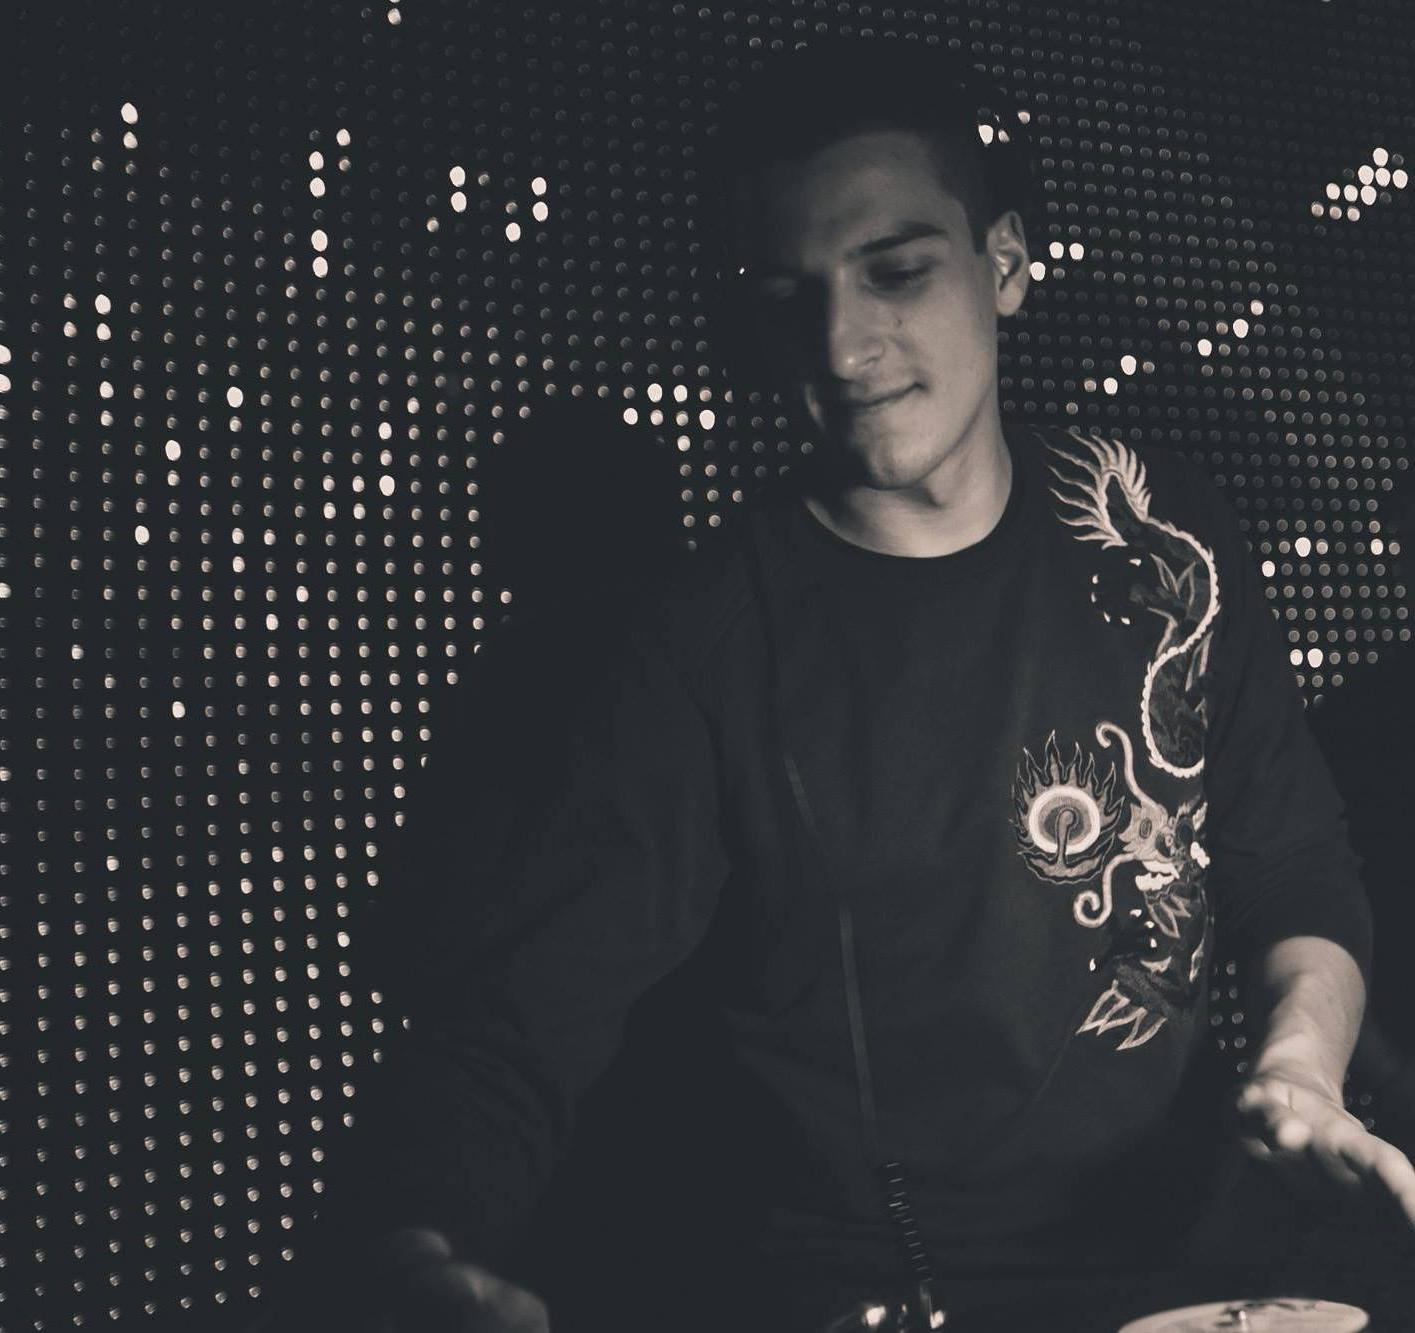 DJ Cream